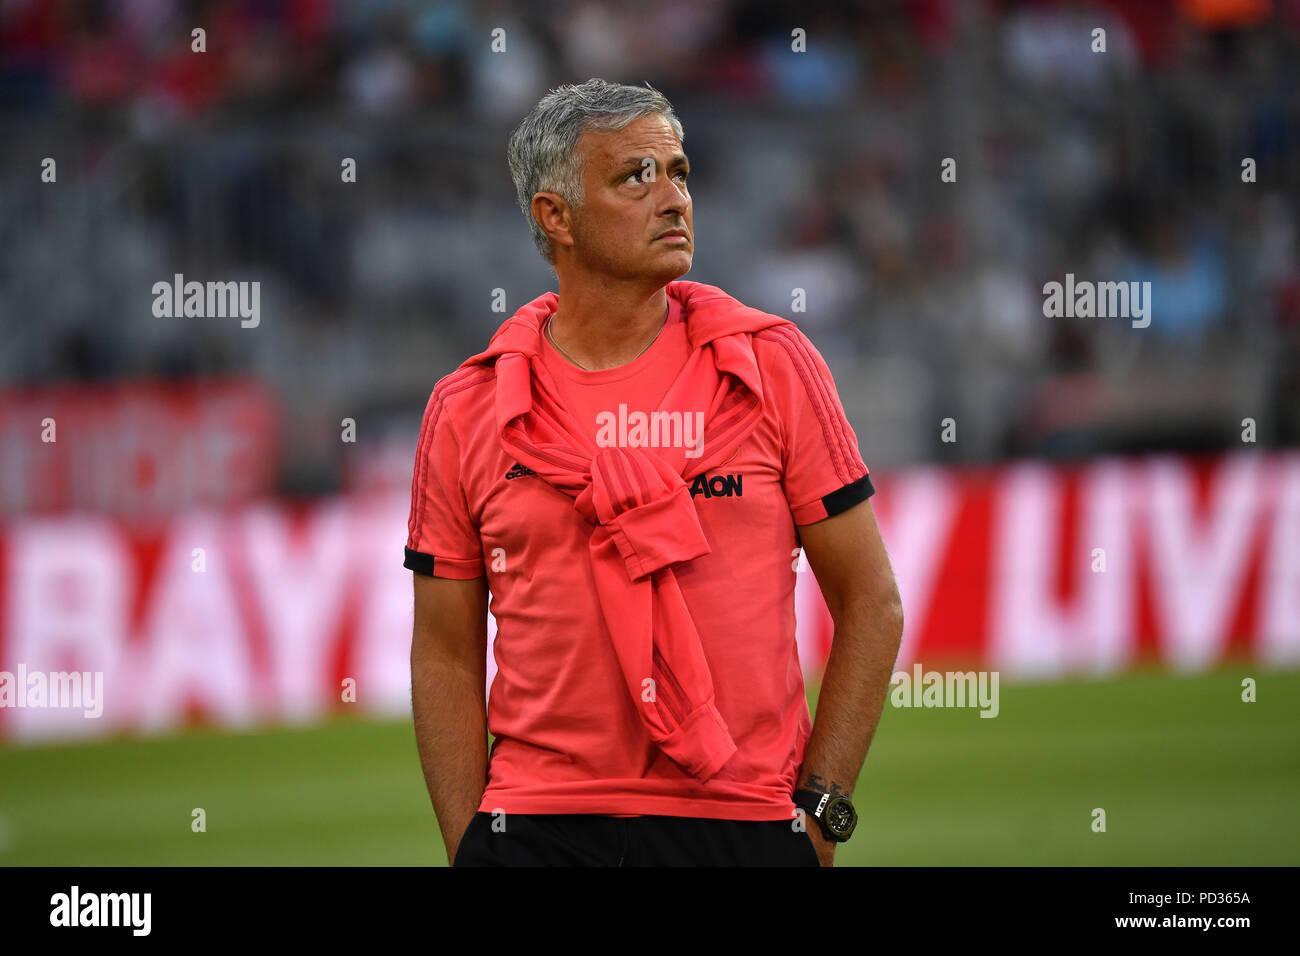 Jose Mourinho Coach Manchester United Single Image Single Cut Motive Half Figure Half Figure Test Match